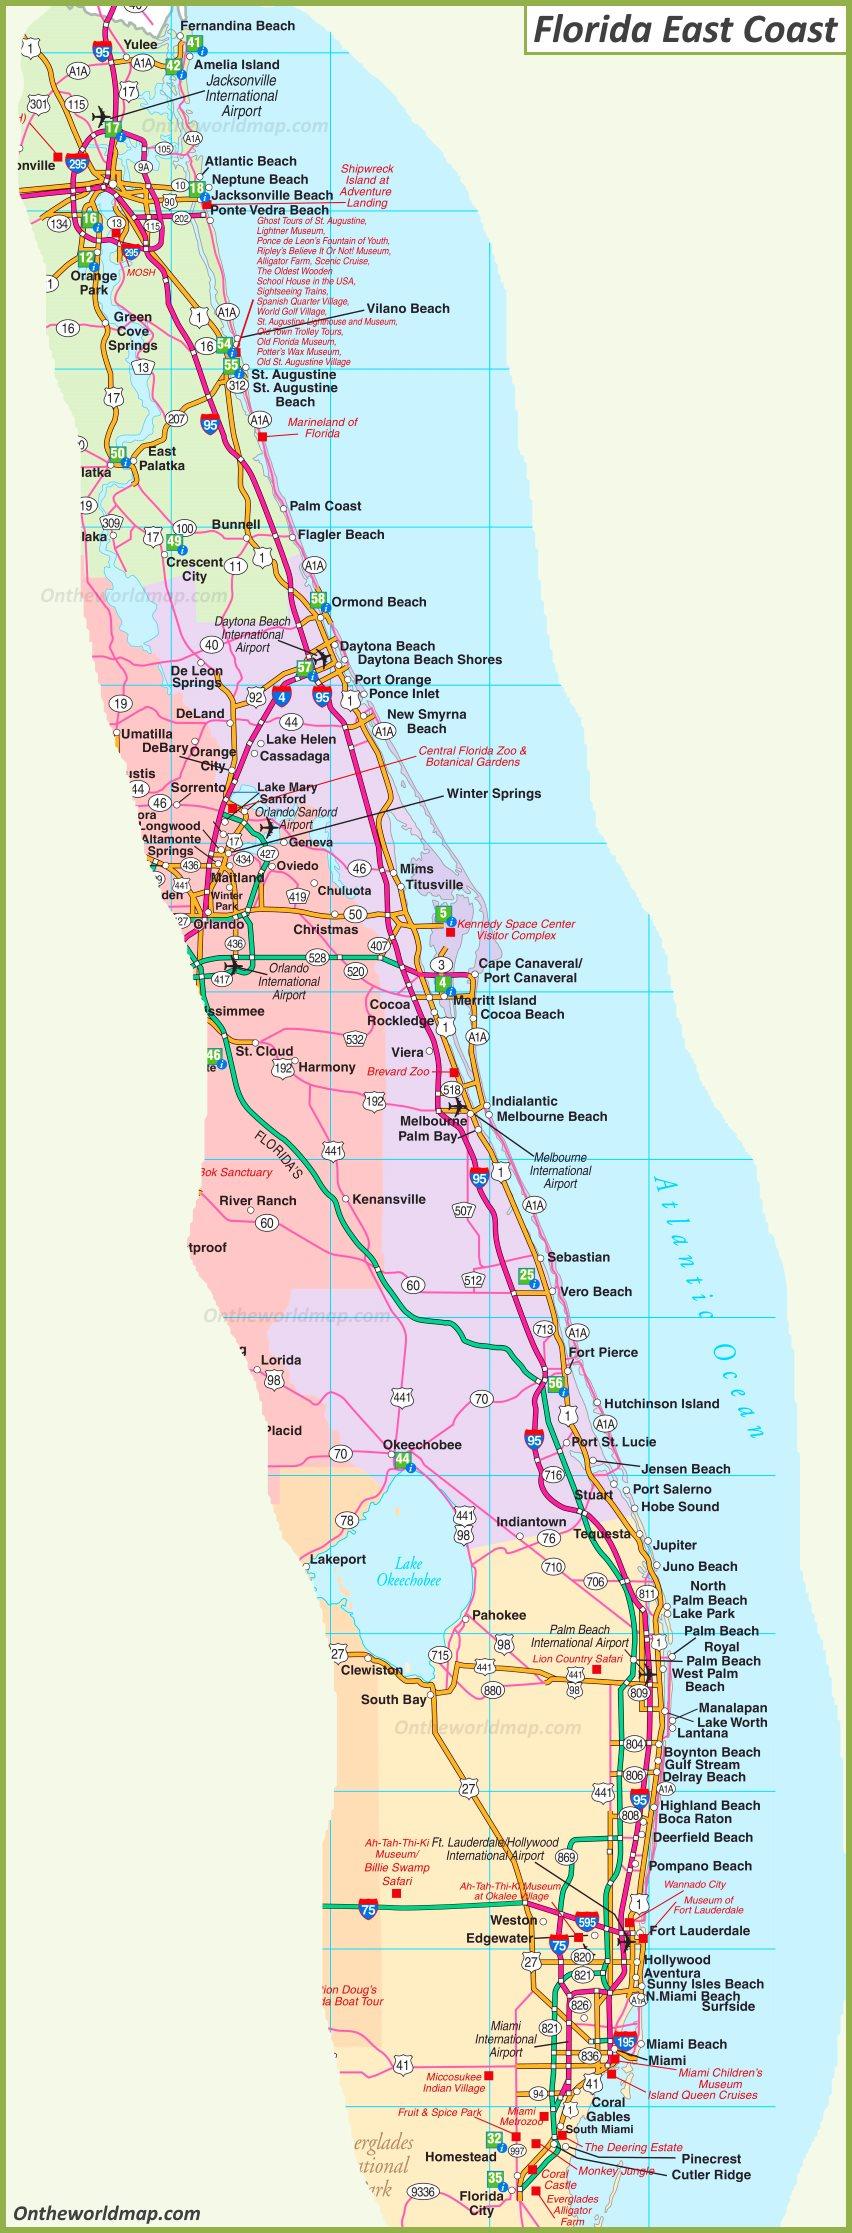 Map Of Florida East Coast - Map Of Florida East Coast